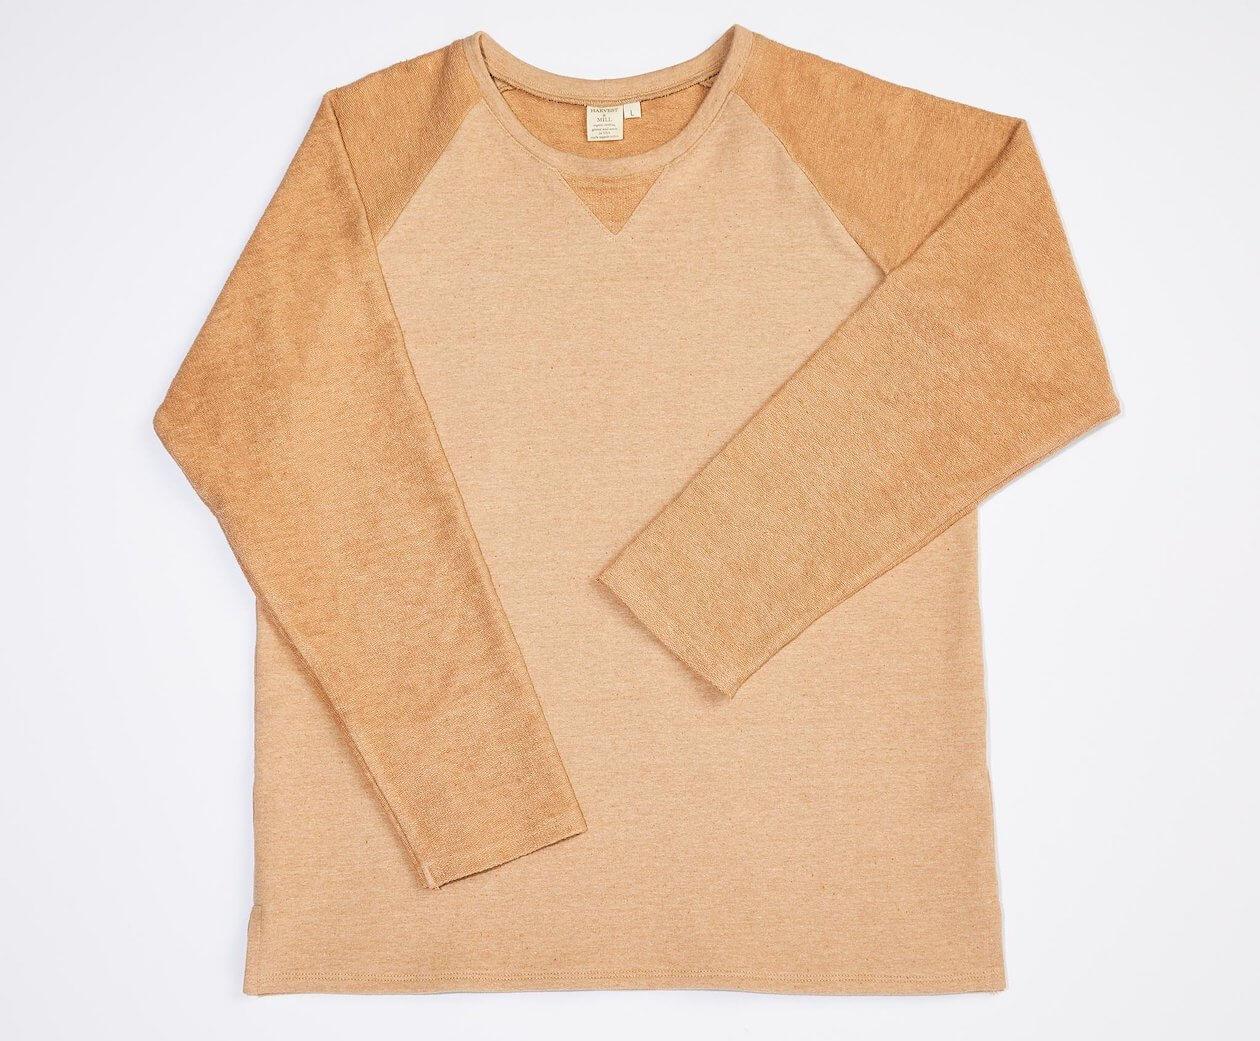 Harvest & Mill's limited edition sweatshirt